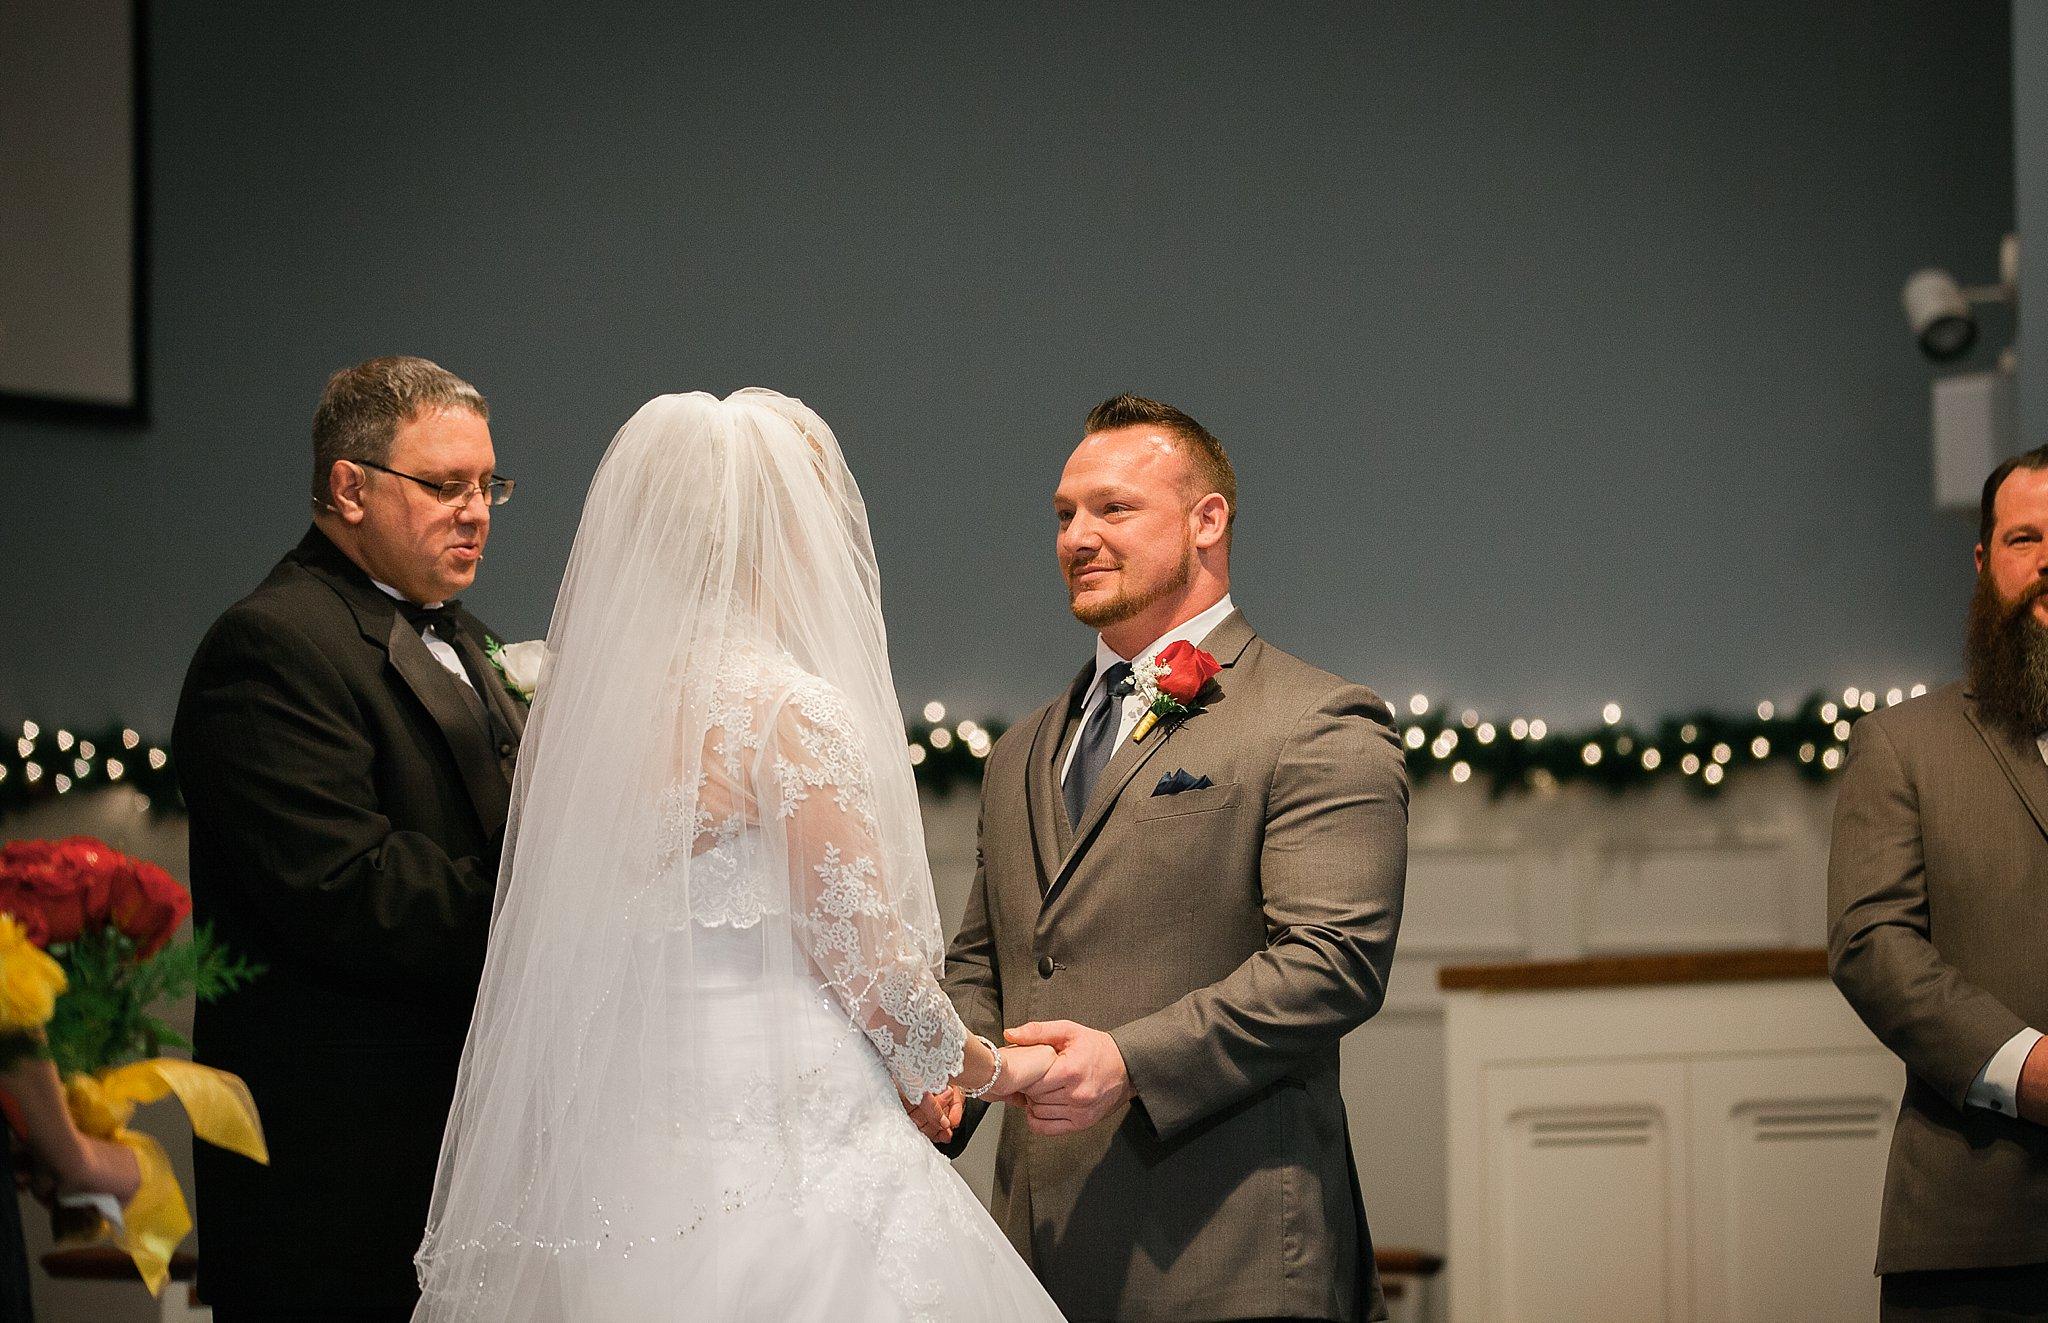 Wollaston Church of the Nazarene Wedding Boston Wedding Photographer17.jpg